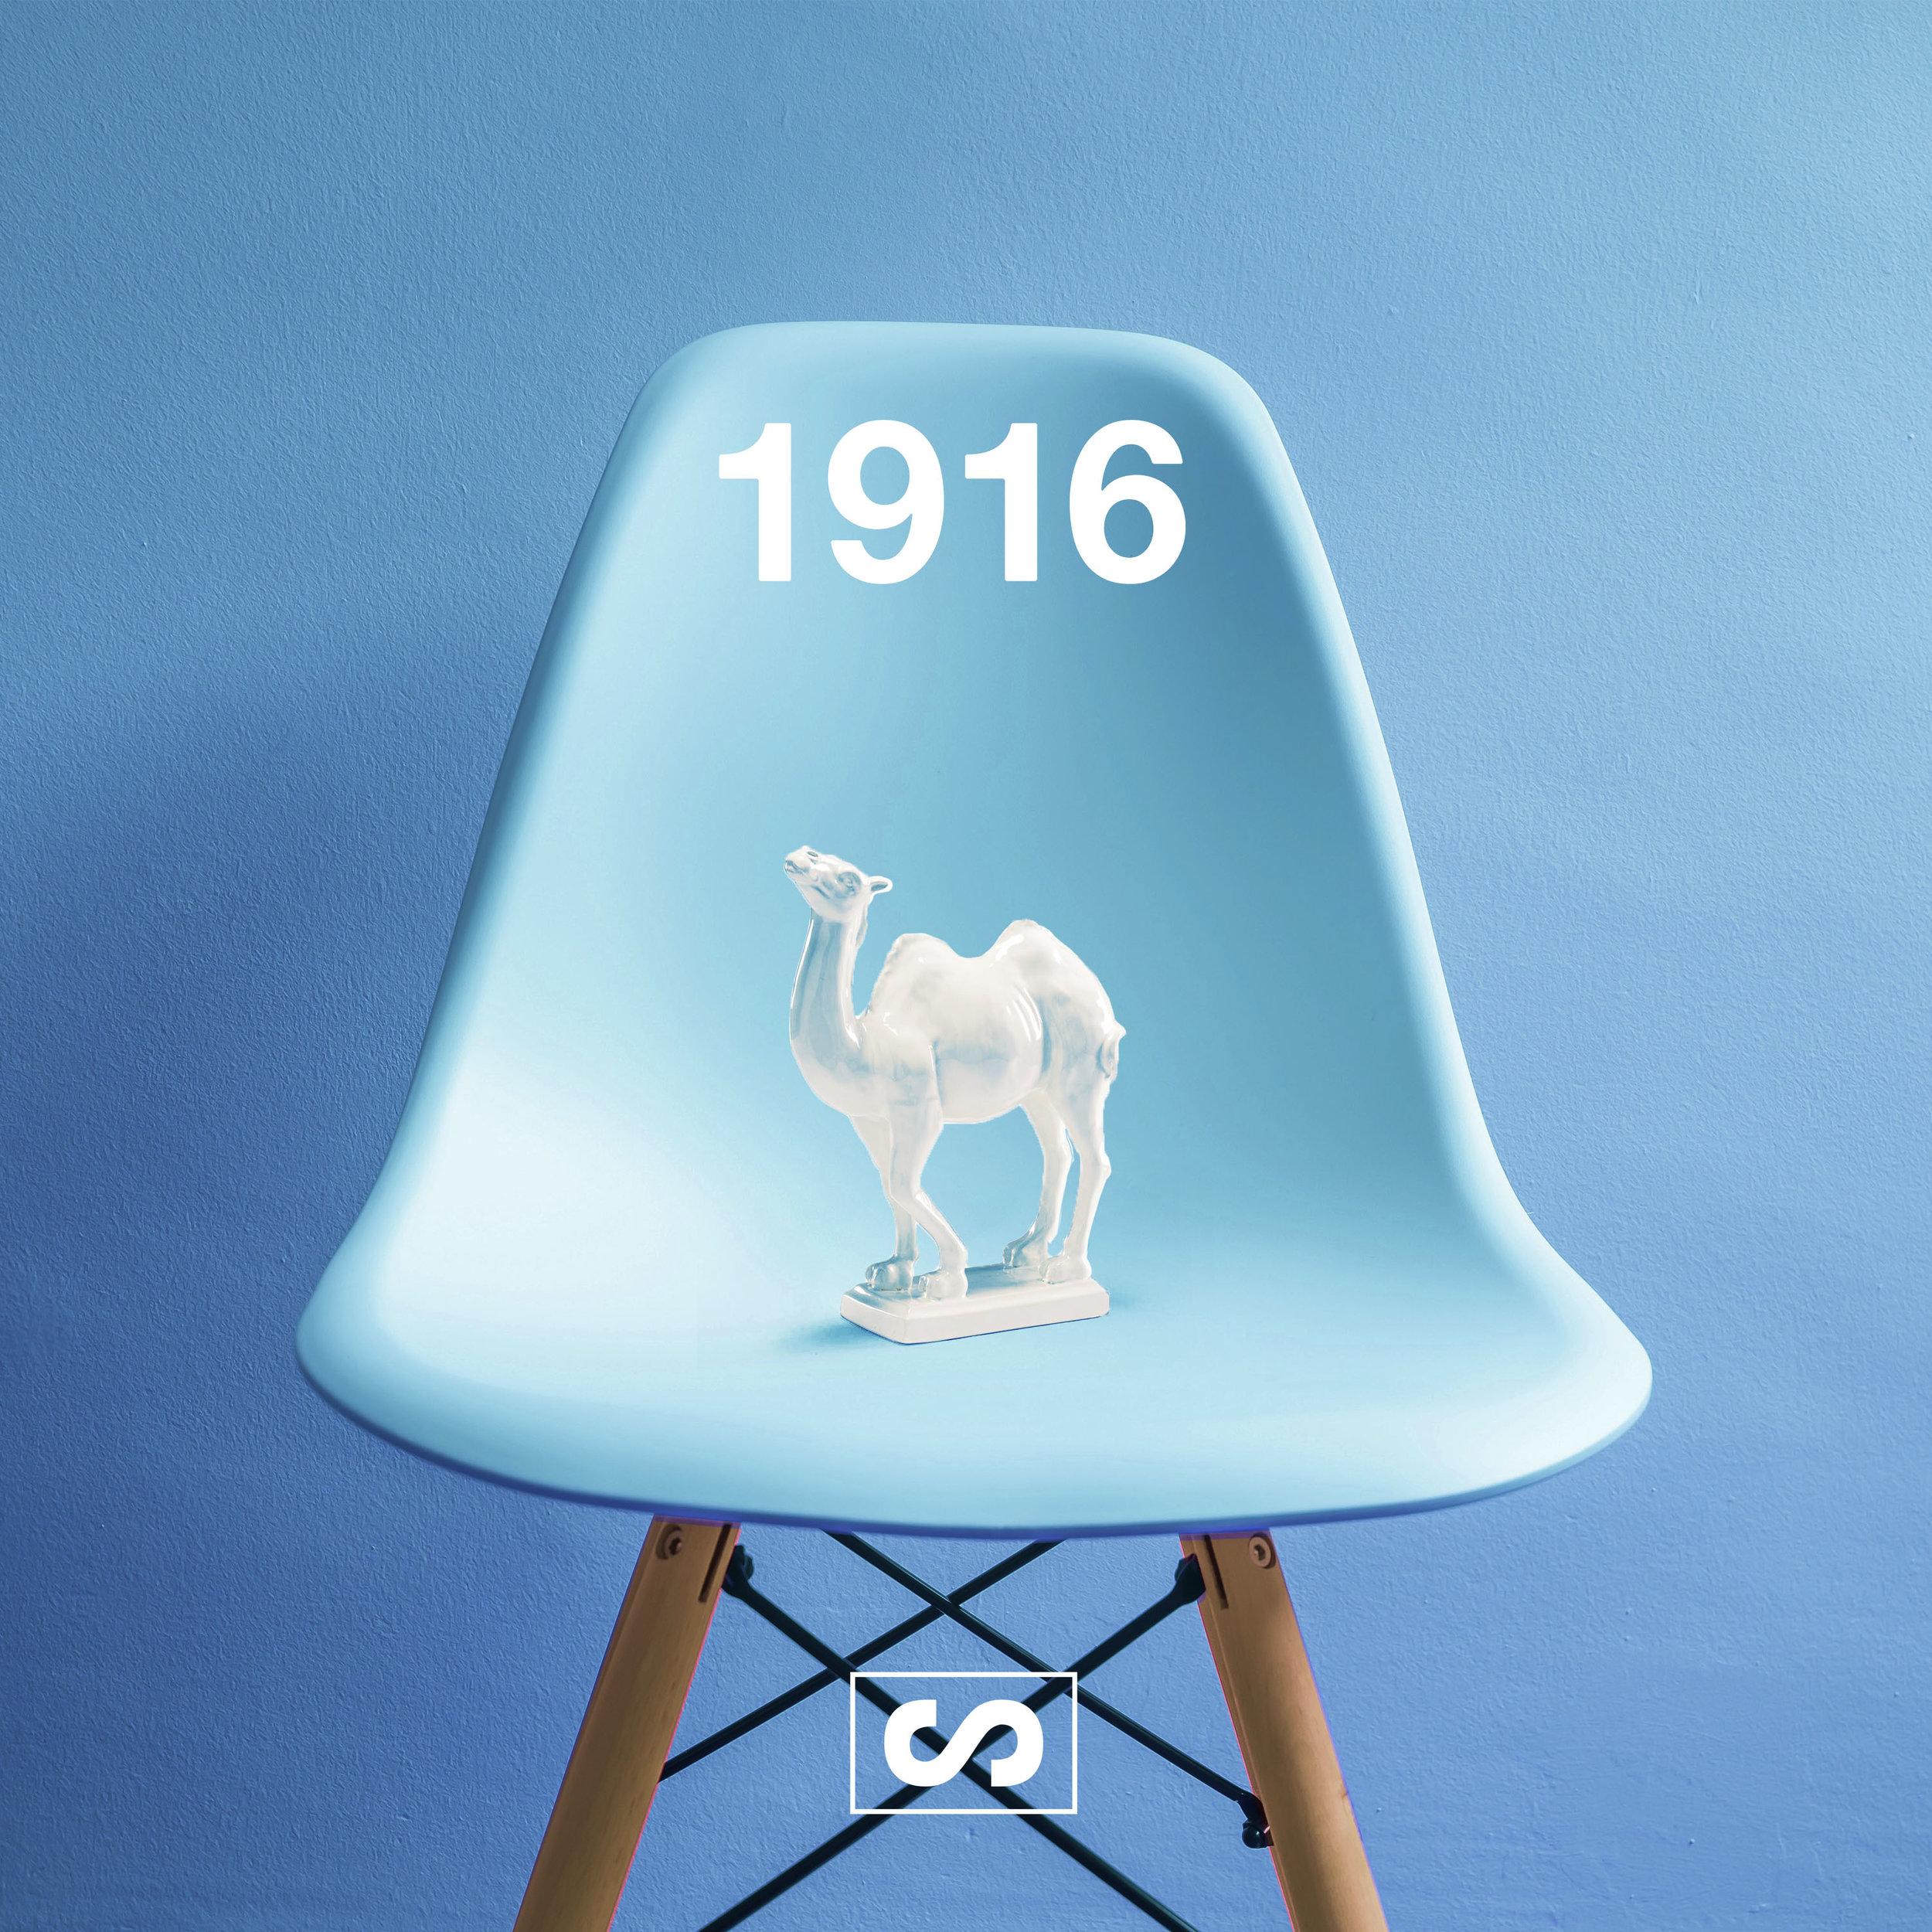 shortlist-1916.jpg